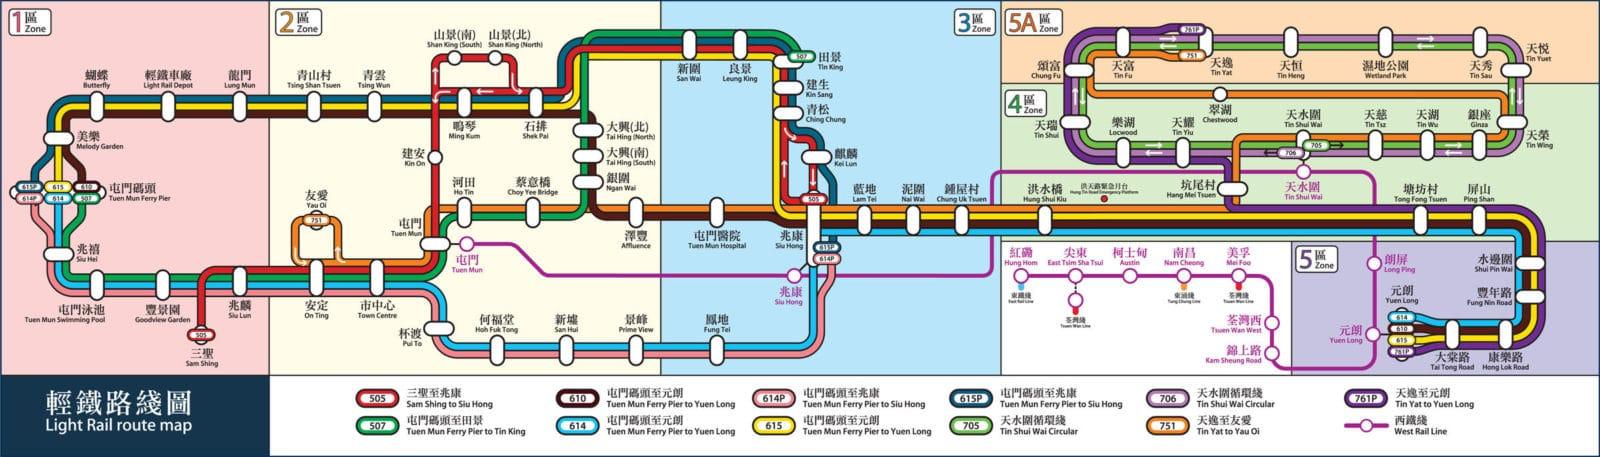 Subway Map Of Hong Kong.Downloadable Hong Kong Mtr Maps Plus Light Rail Tram China Mike